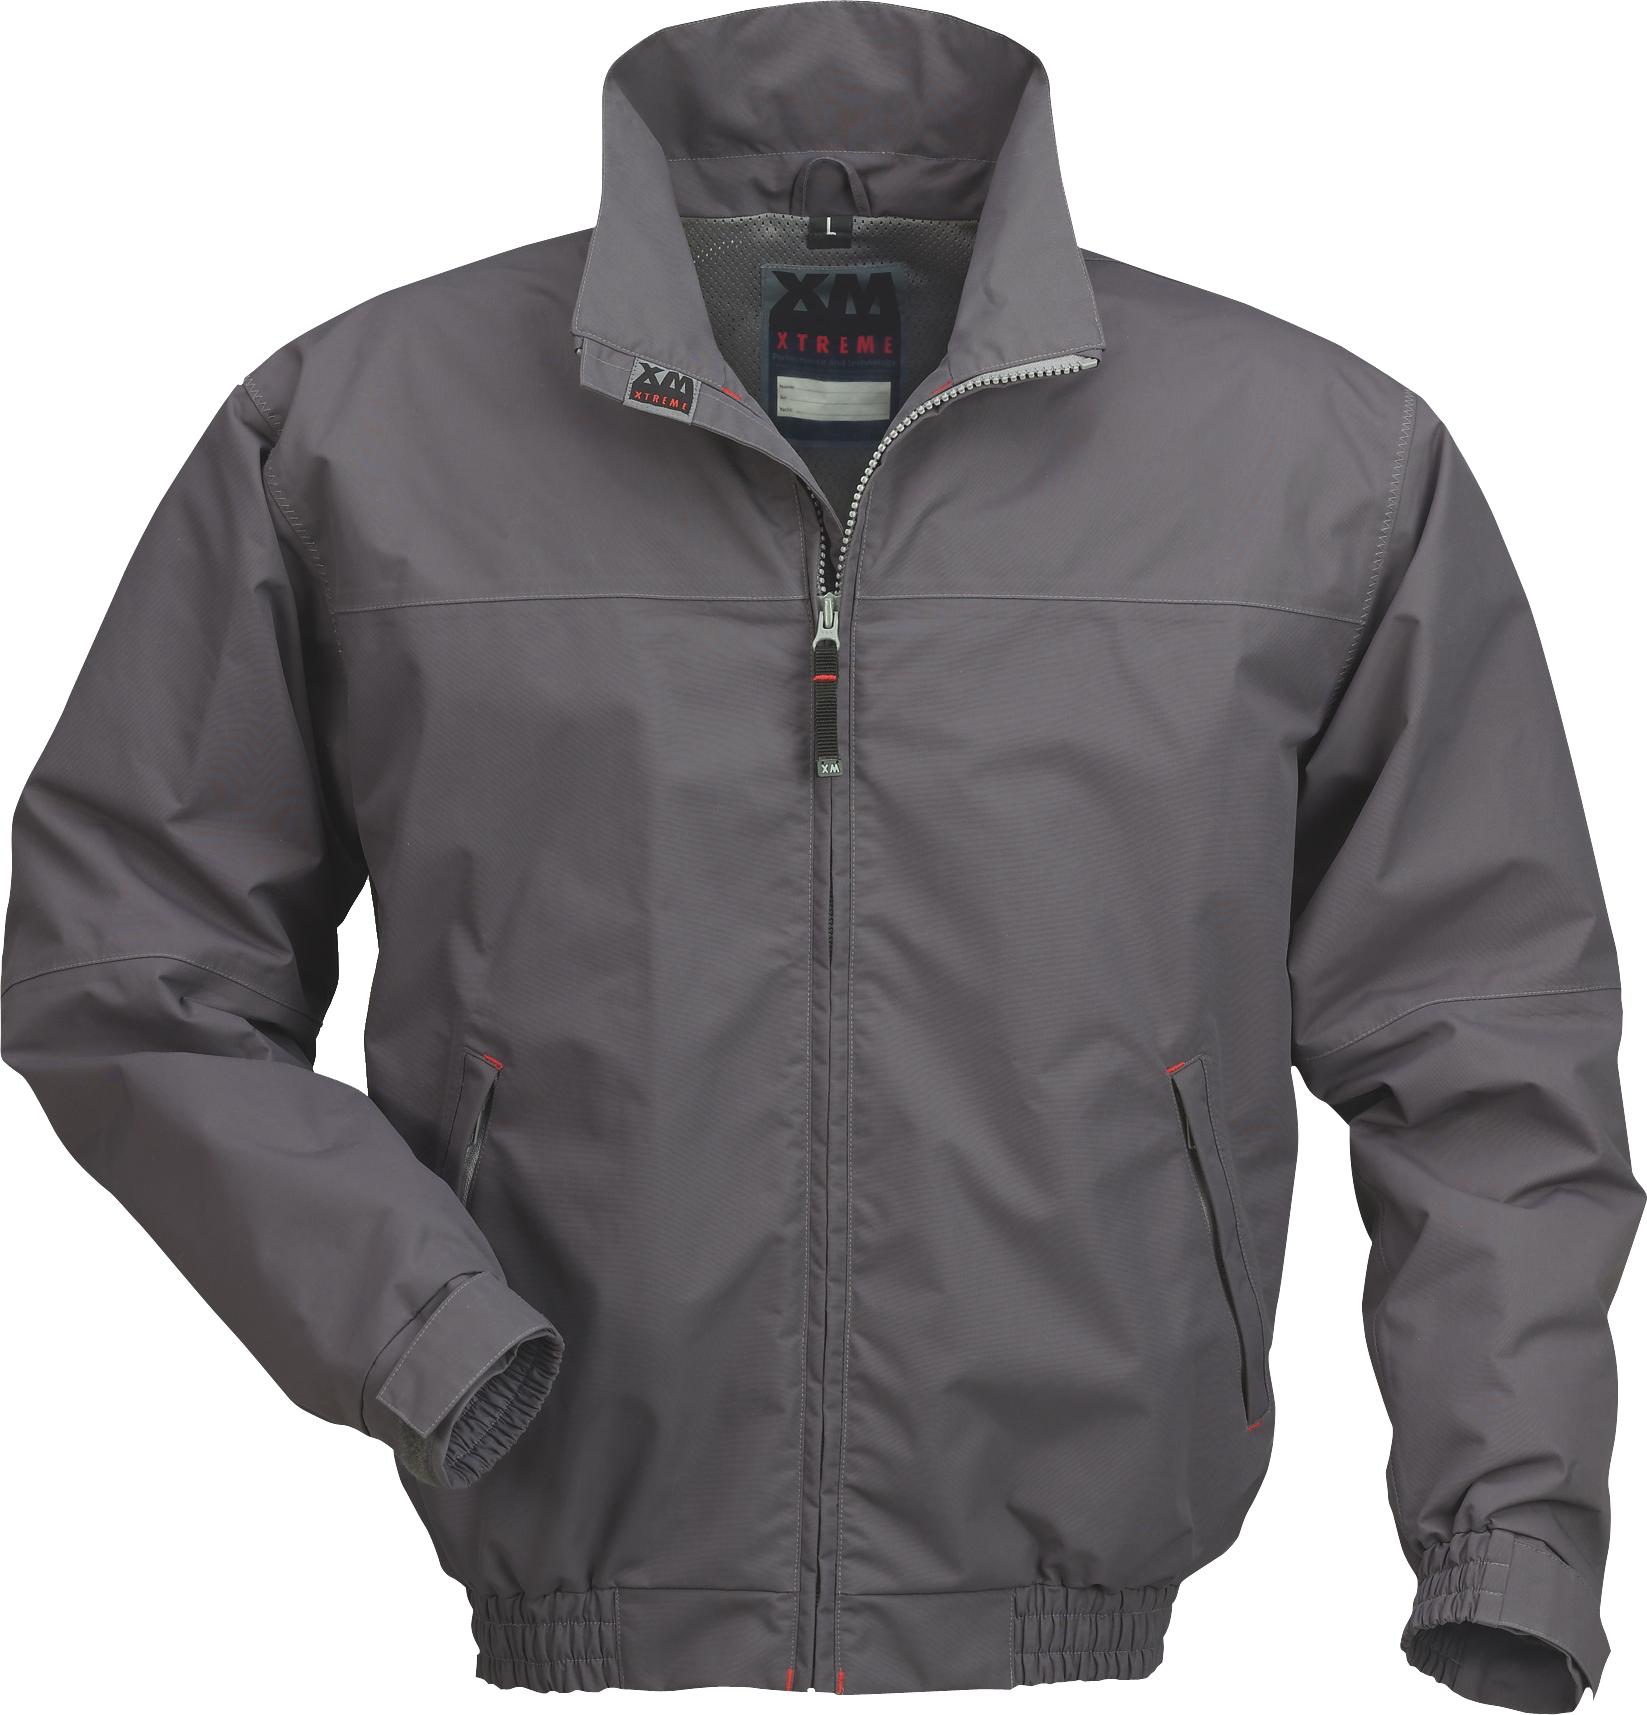 Jacket PNG images free download.